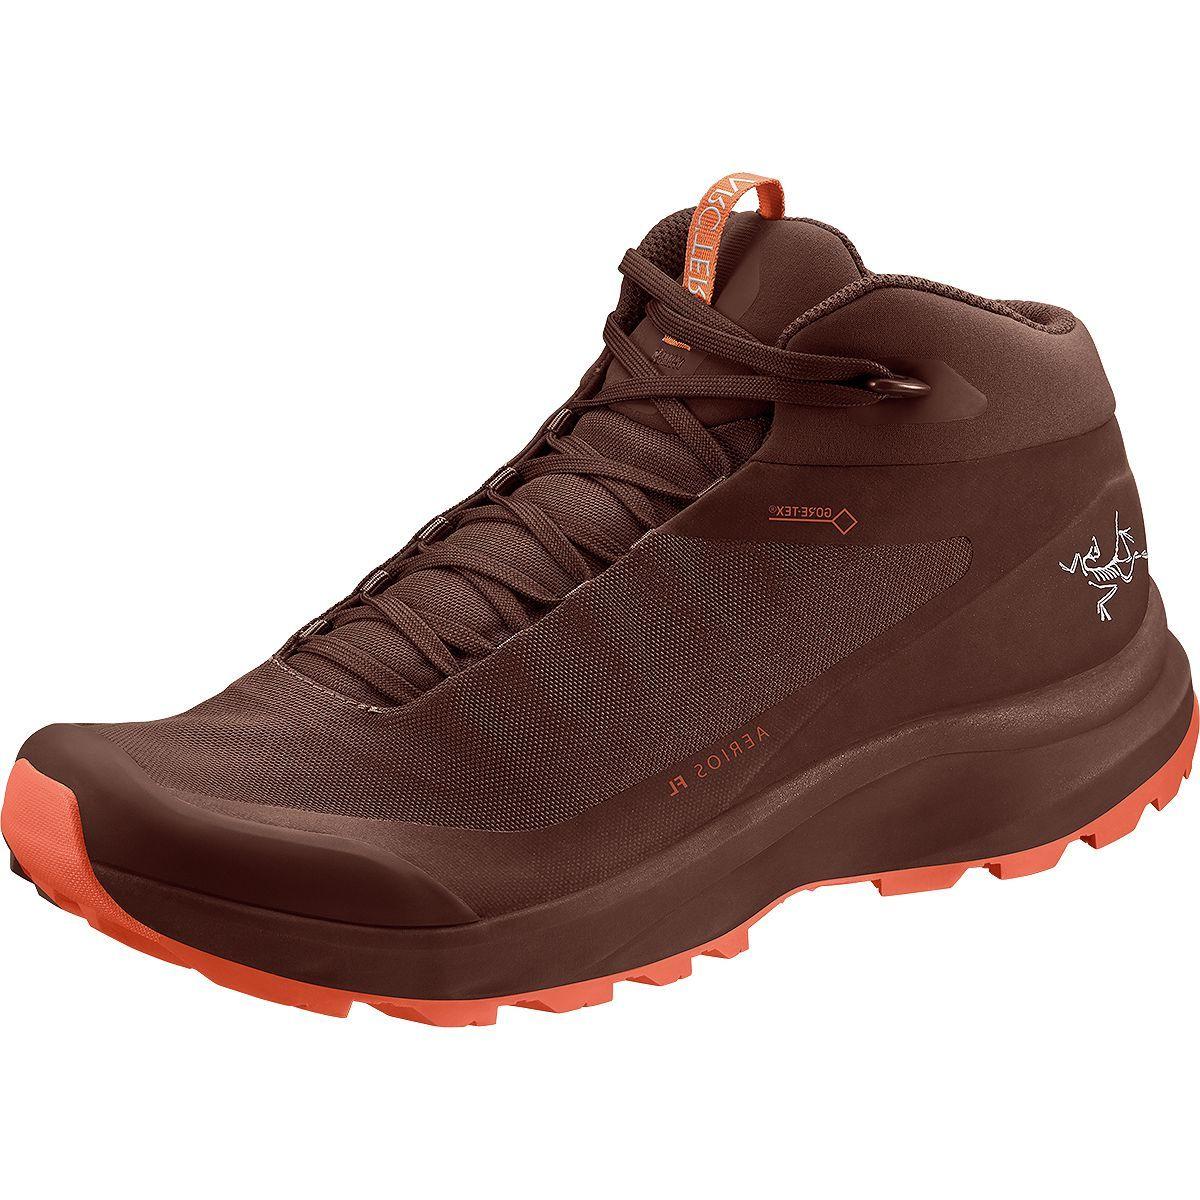 Arc'teryx Aerios FL GTX Mid Hiking Boot - Women's